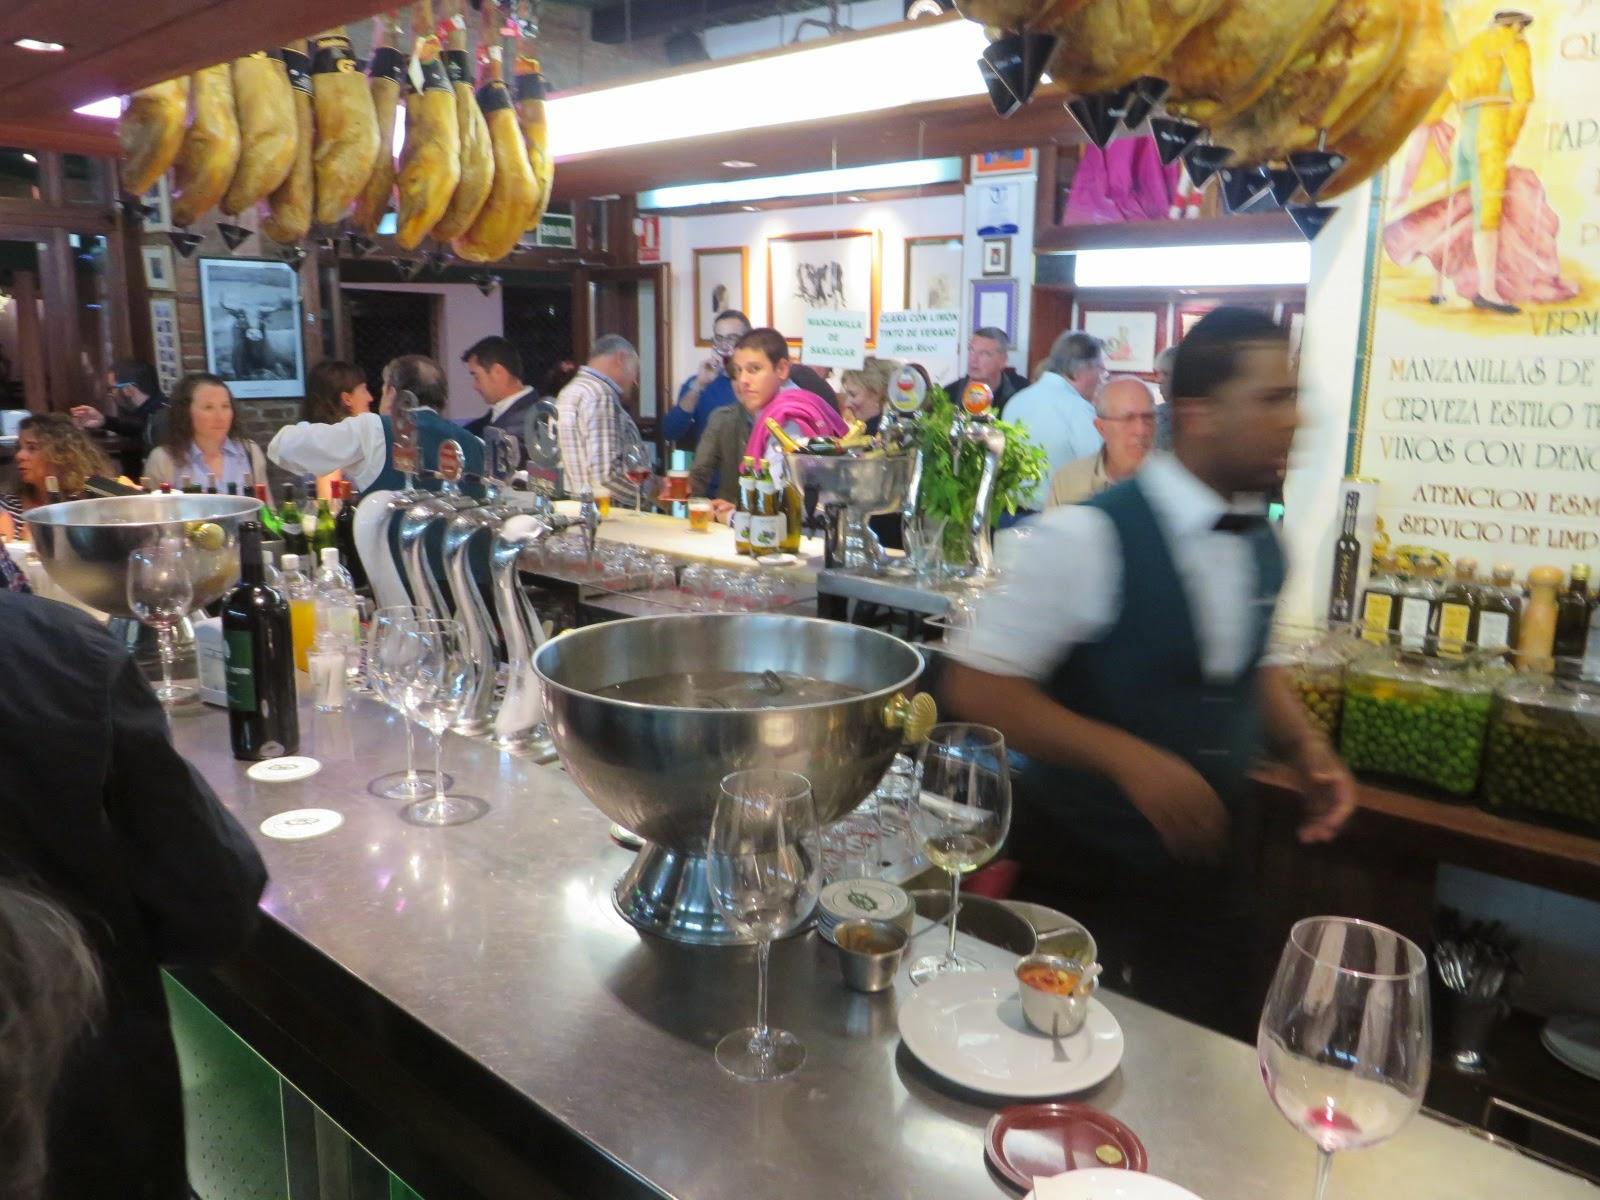 Urbina vinos blog bar tapas restaurante camarote madrid - Decoracion bares de tapas ...